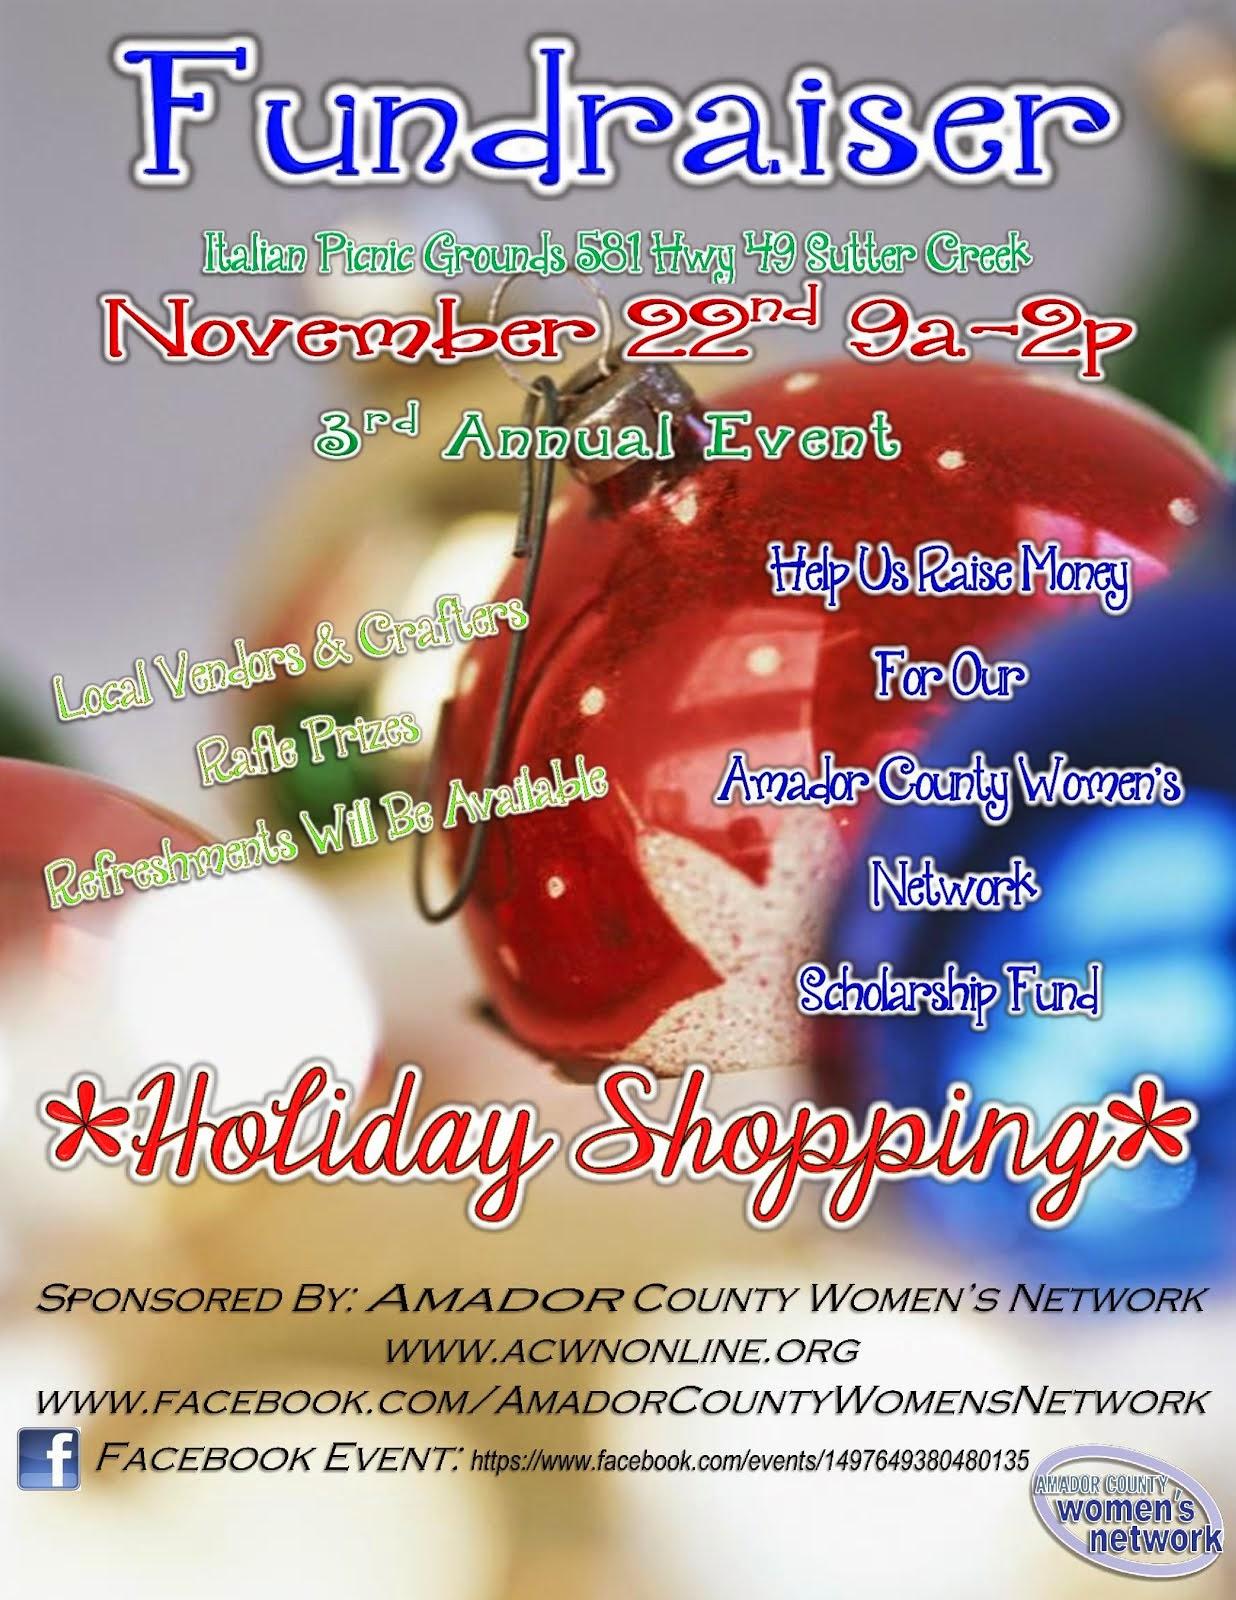 ACWN Holiday Fundraiser - Wed Nov 22